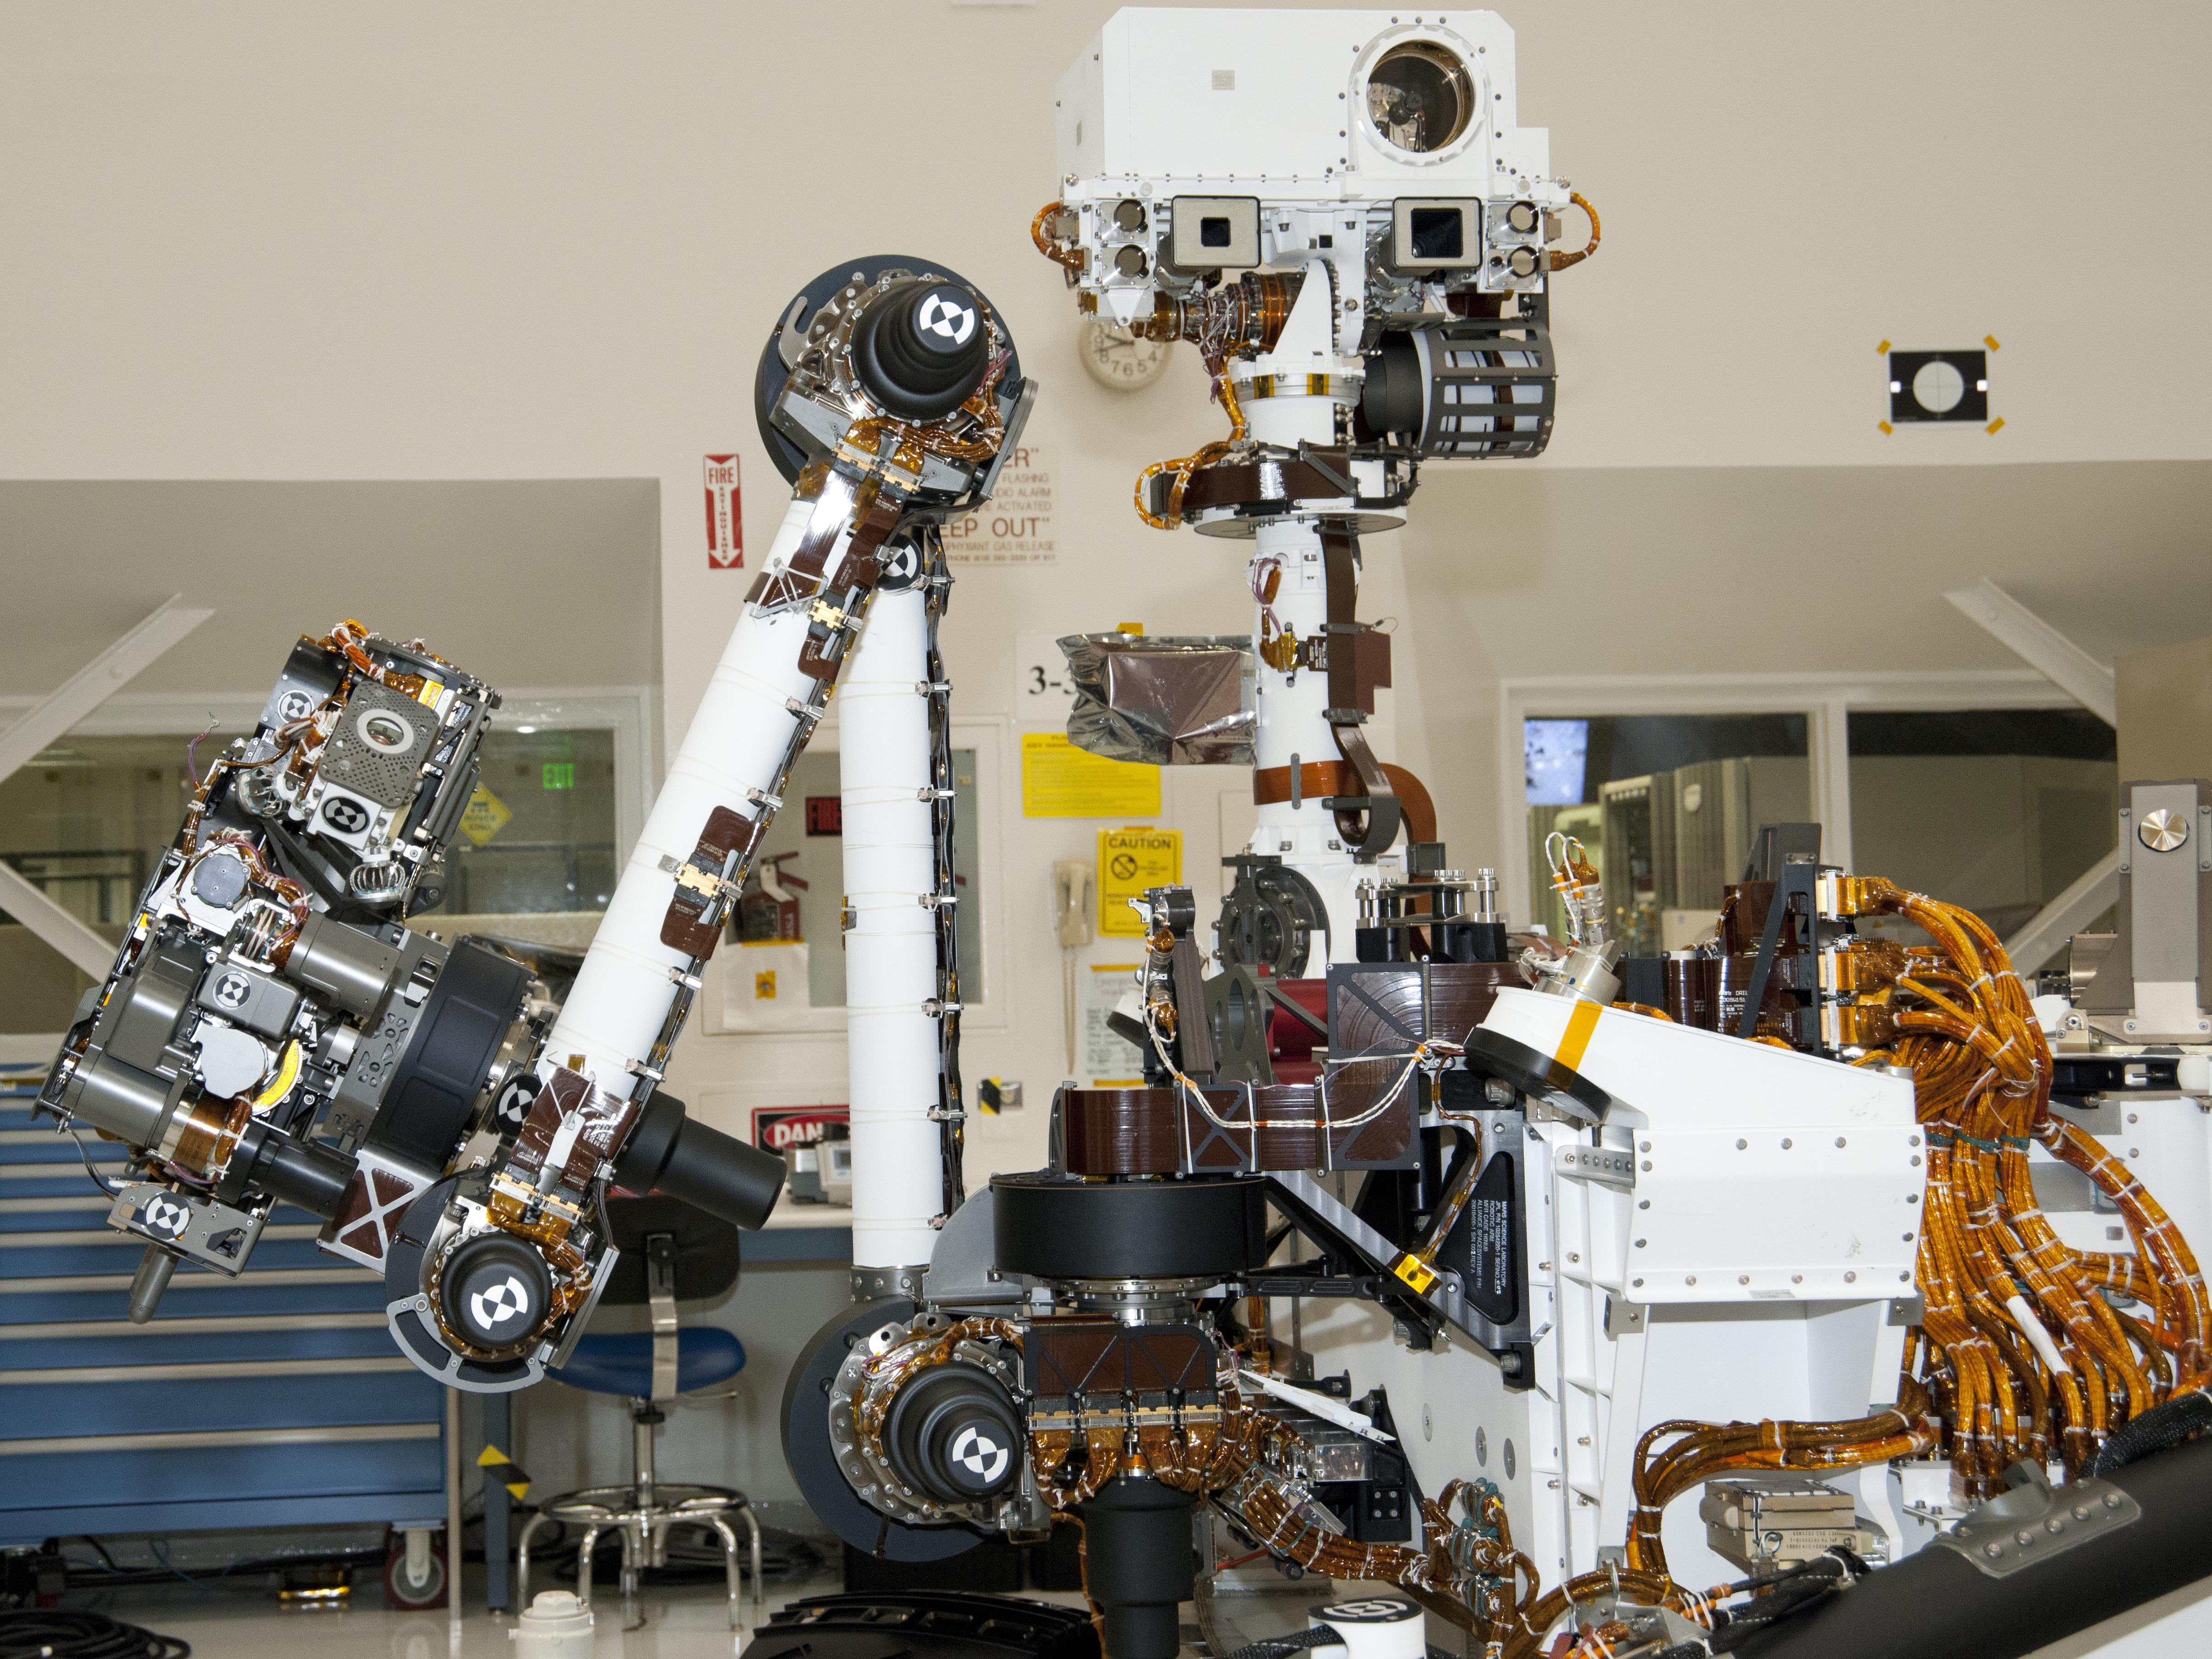 File Arm and Mast of NASA Mars Rover Curiosity main pia